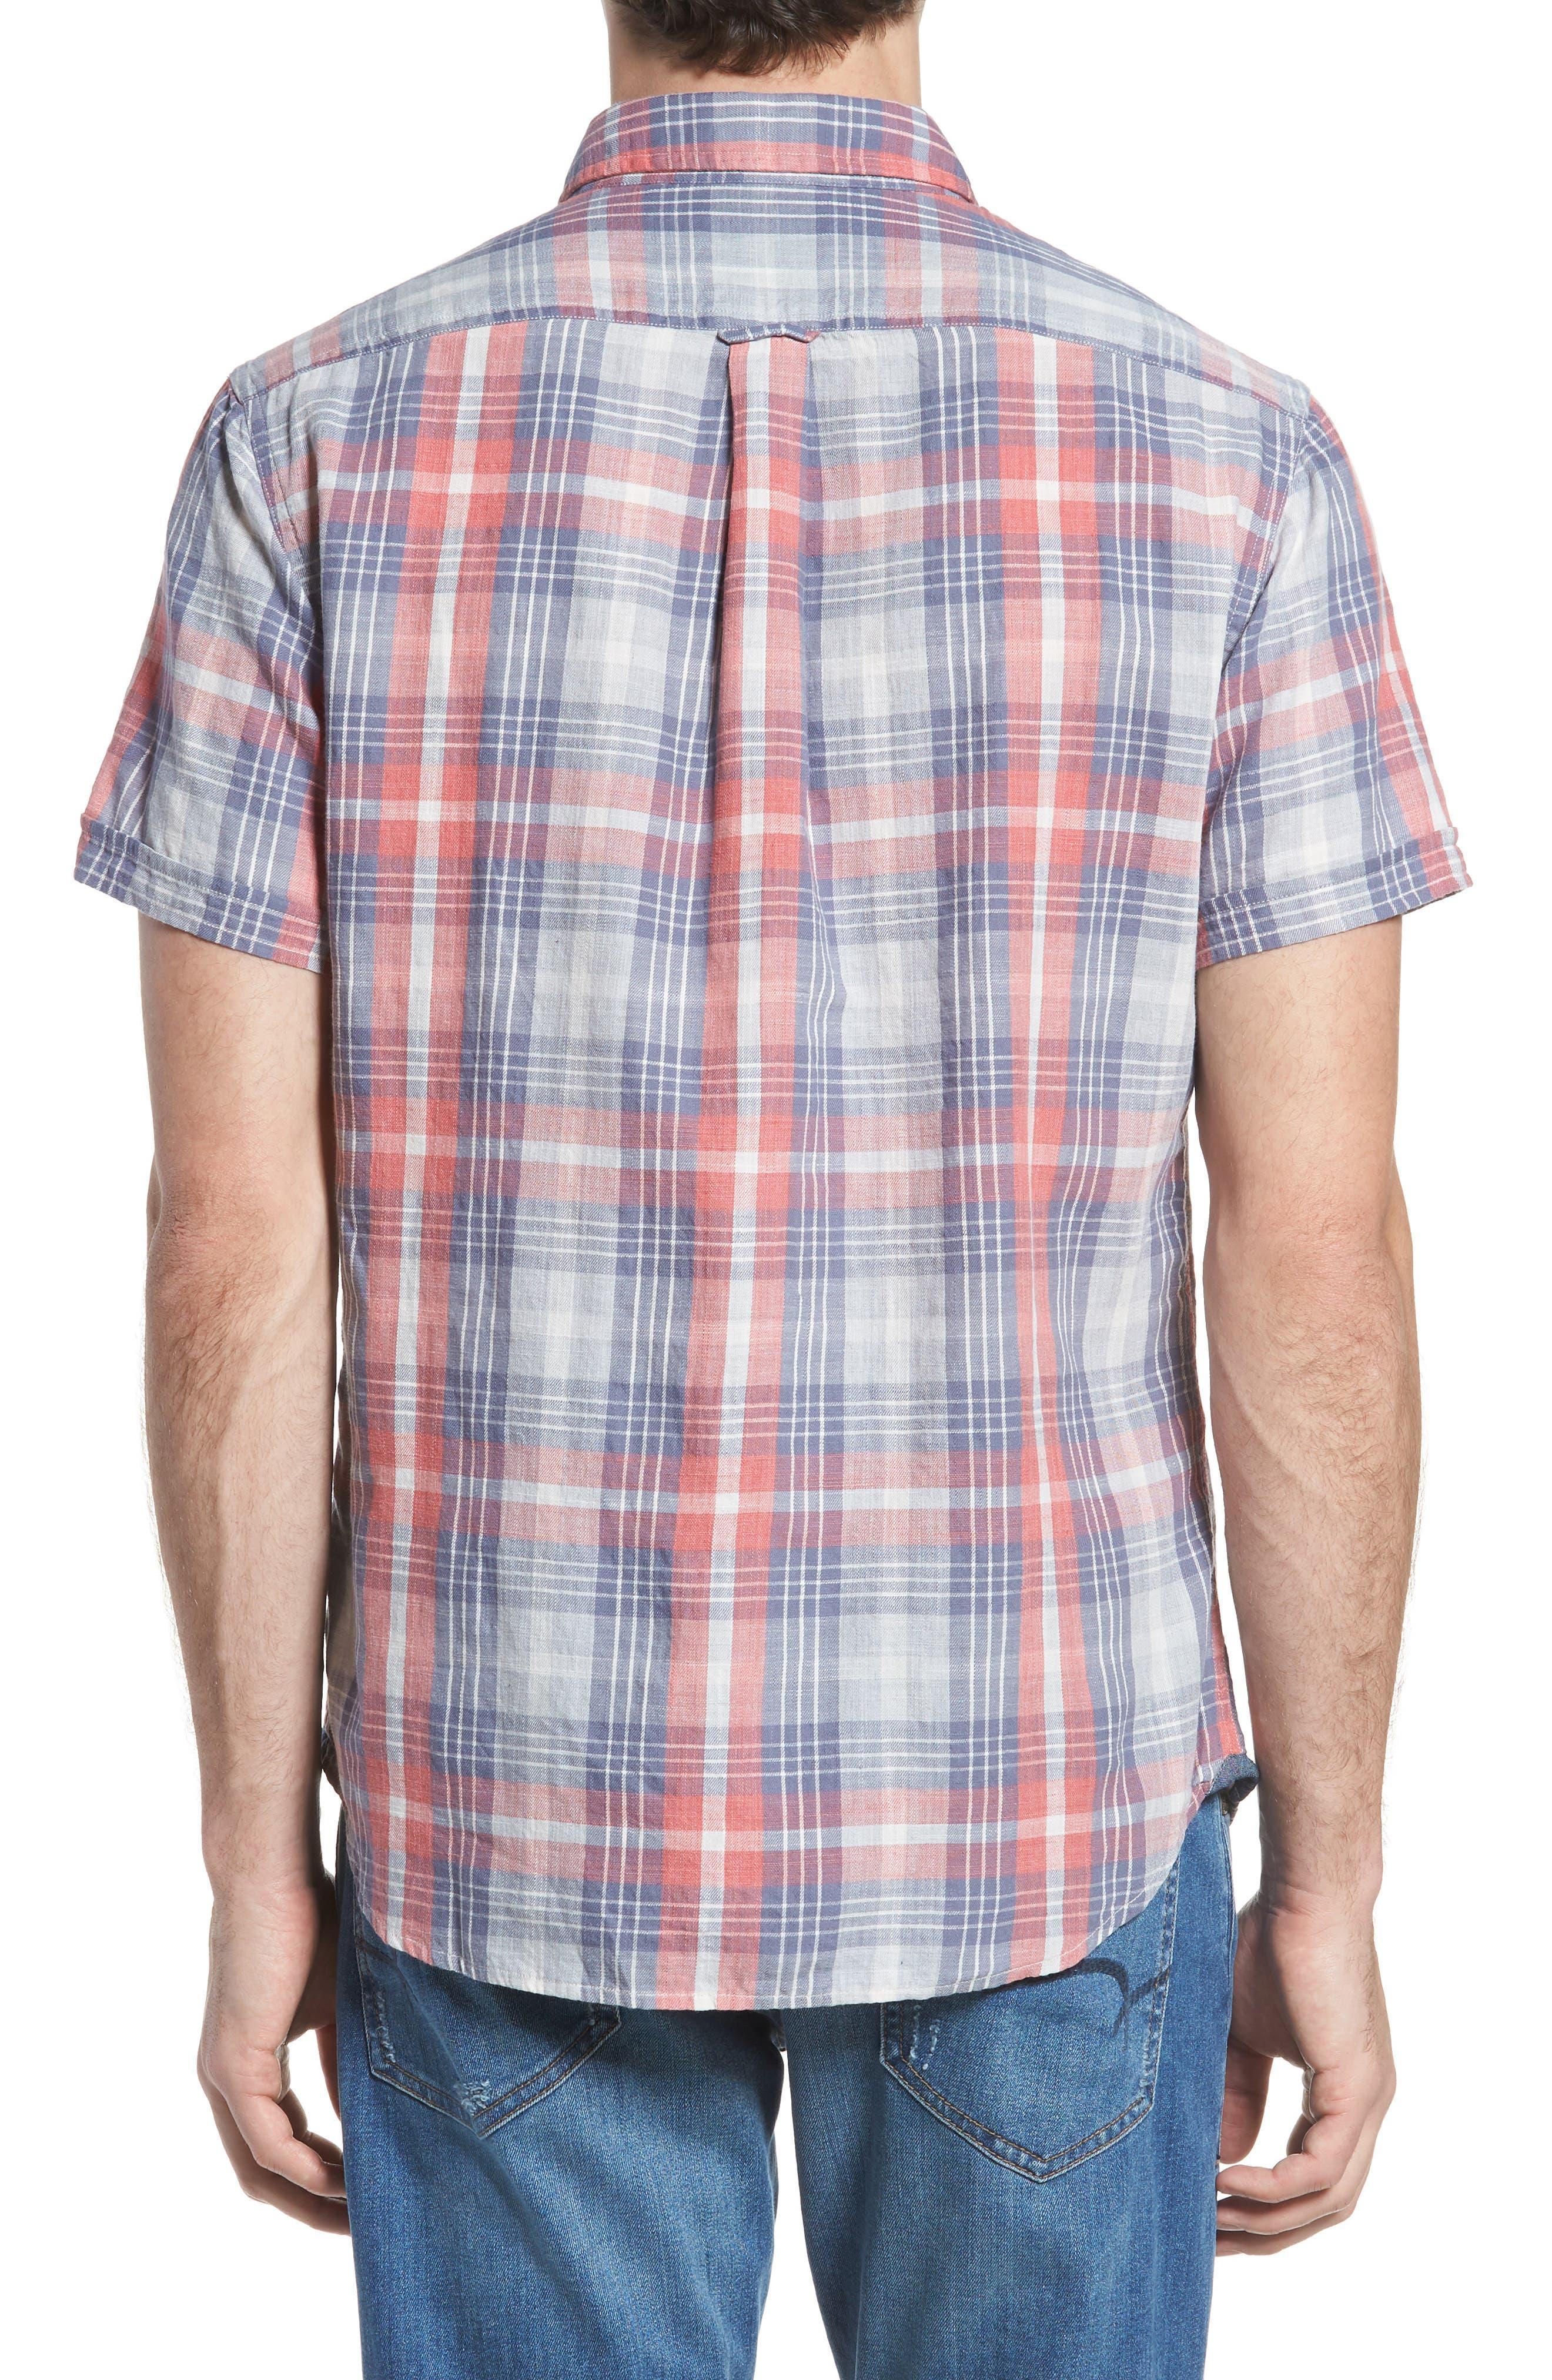 Reynolds Short Sleeve Sport Shirt,                             Alternate thumbnail 3, color,                             Red Gray Plaid